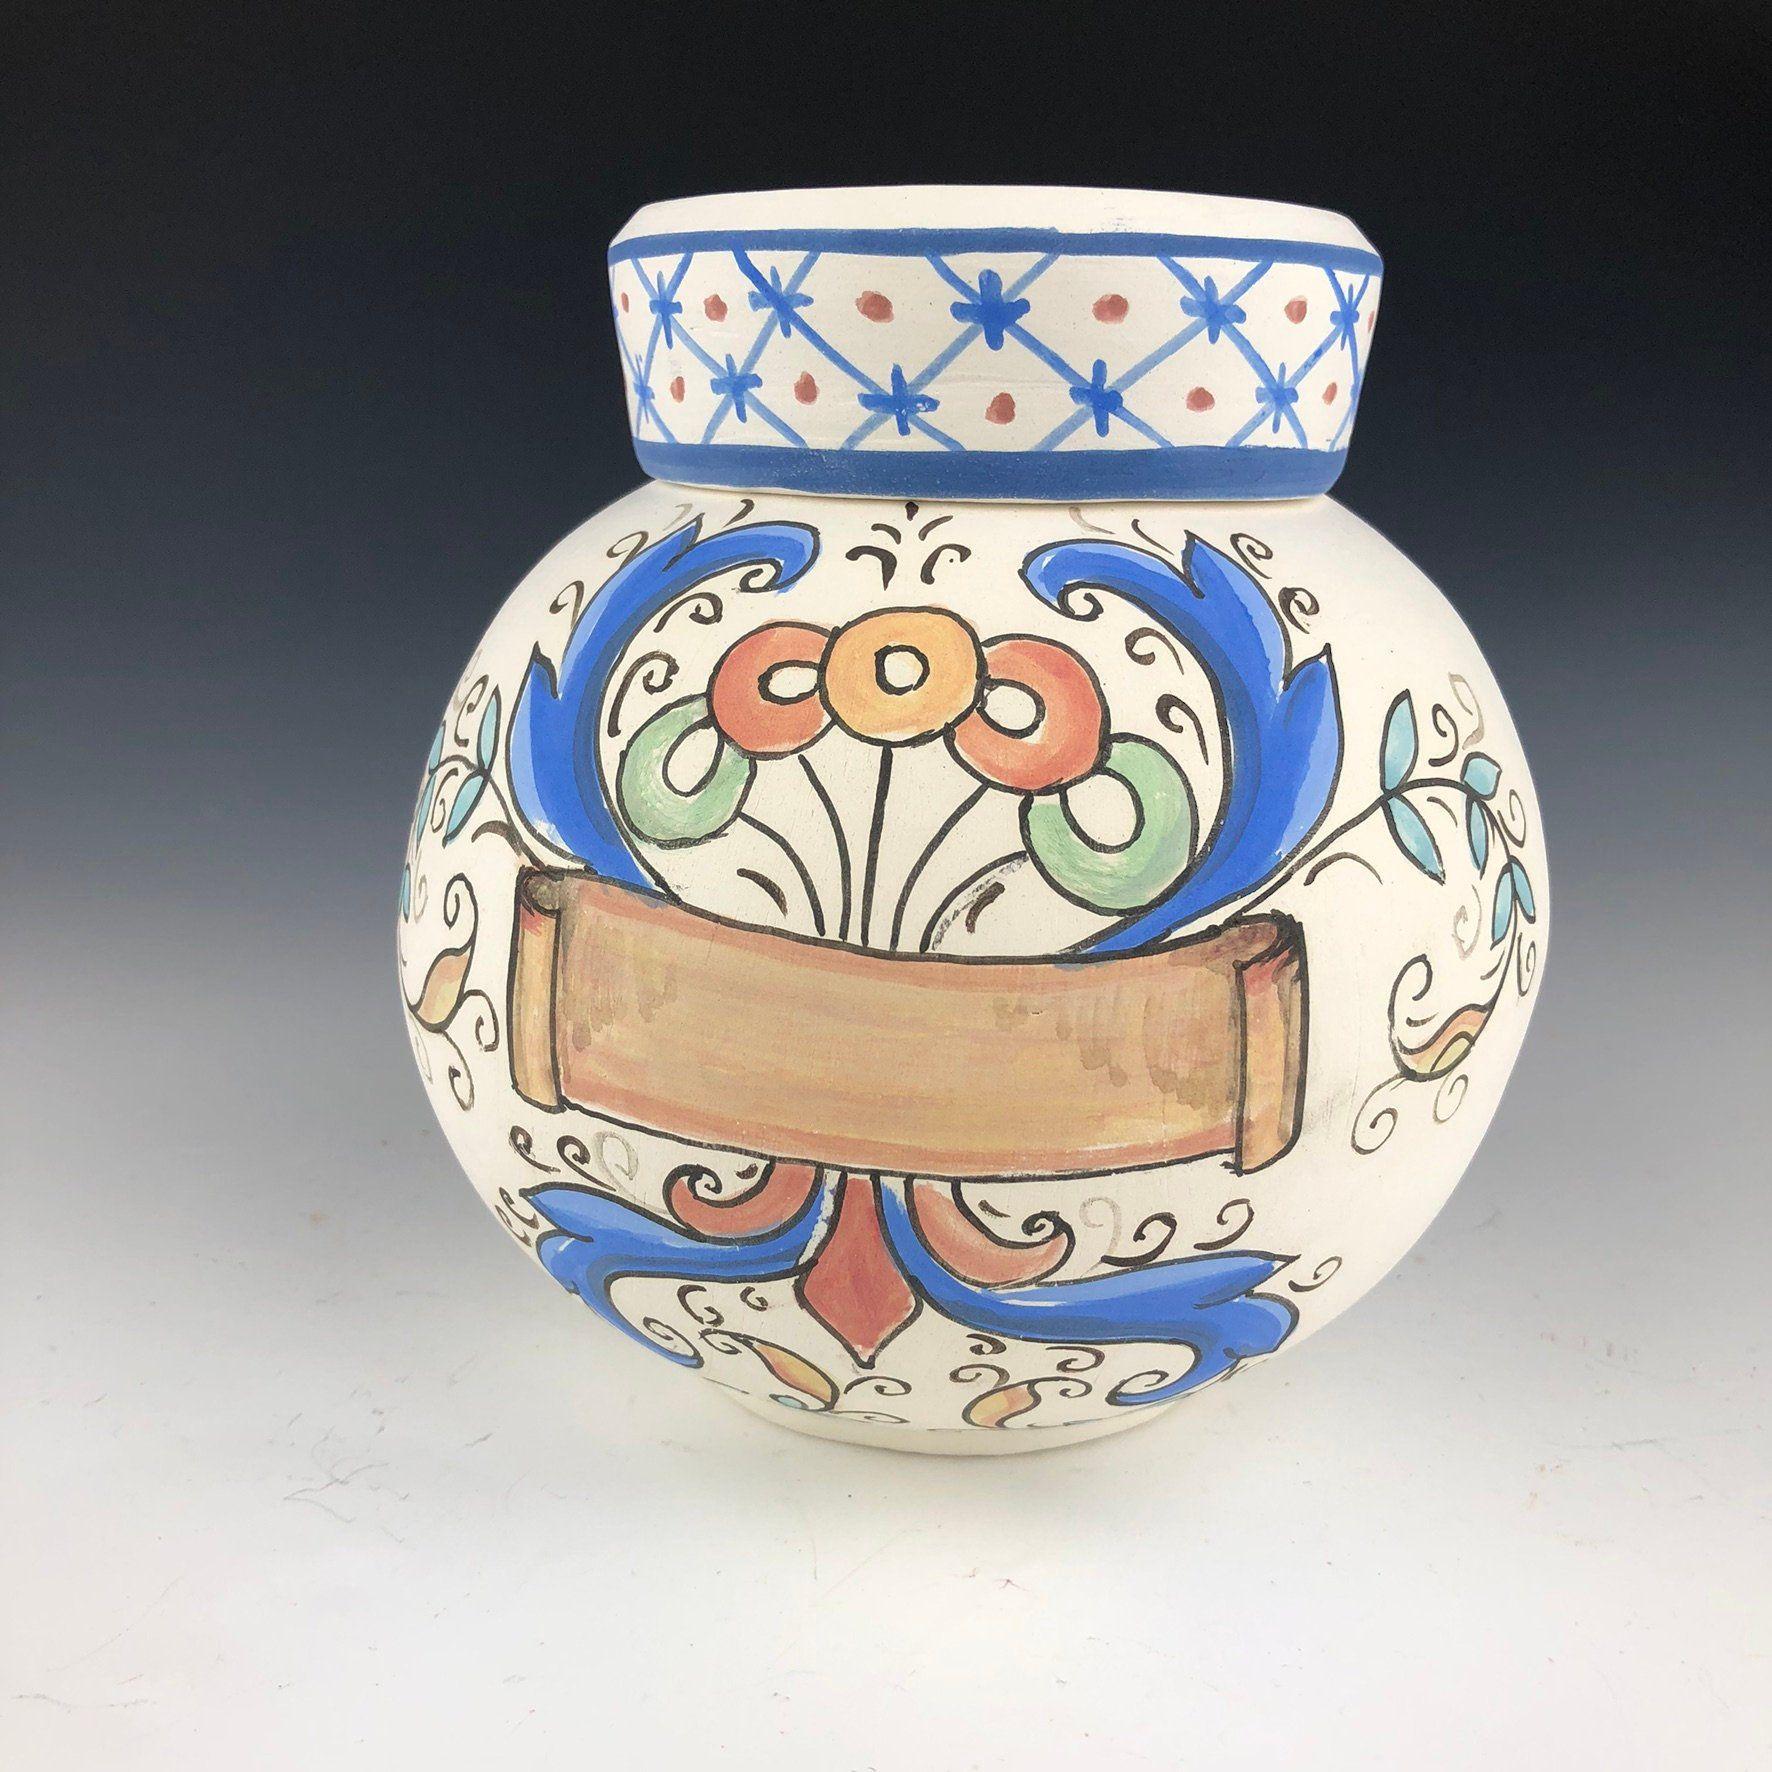 Personalized pet cat dog Deruta Italian style urn or